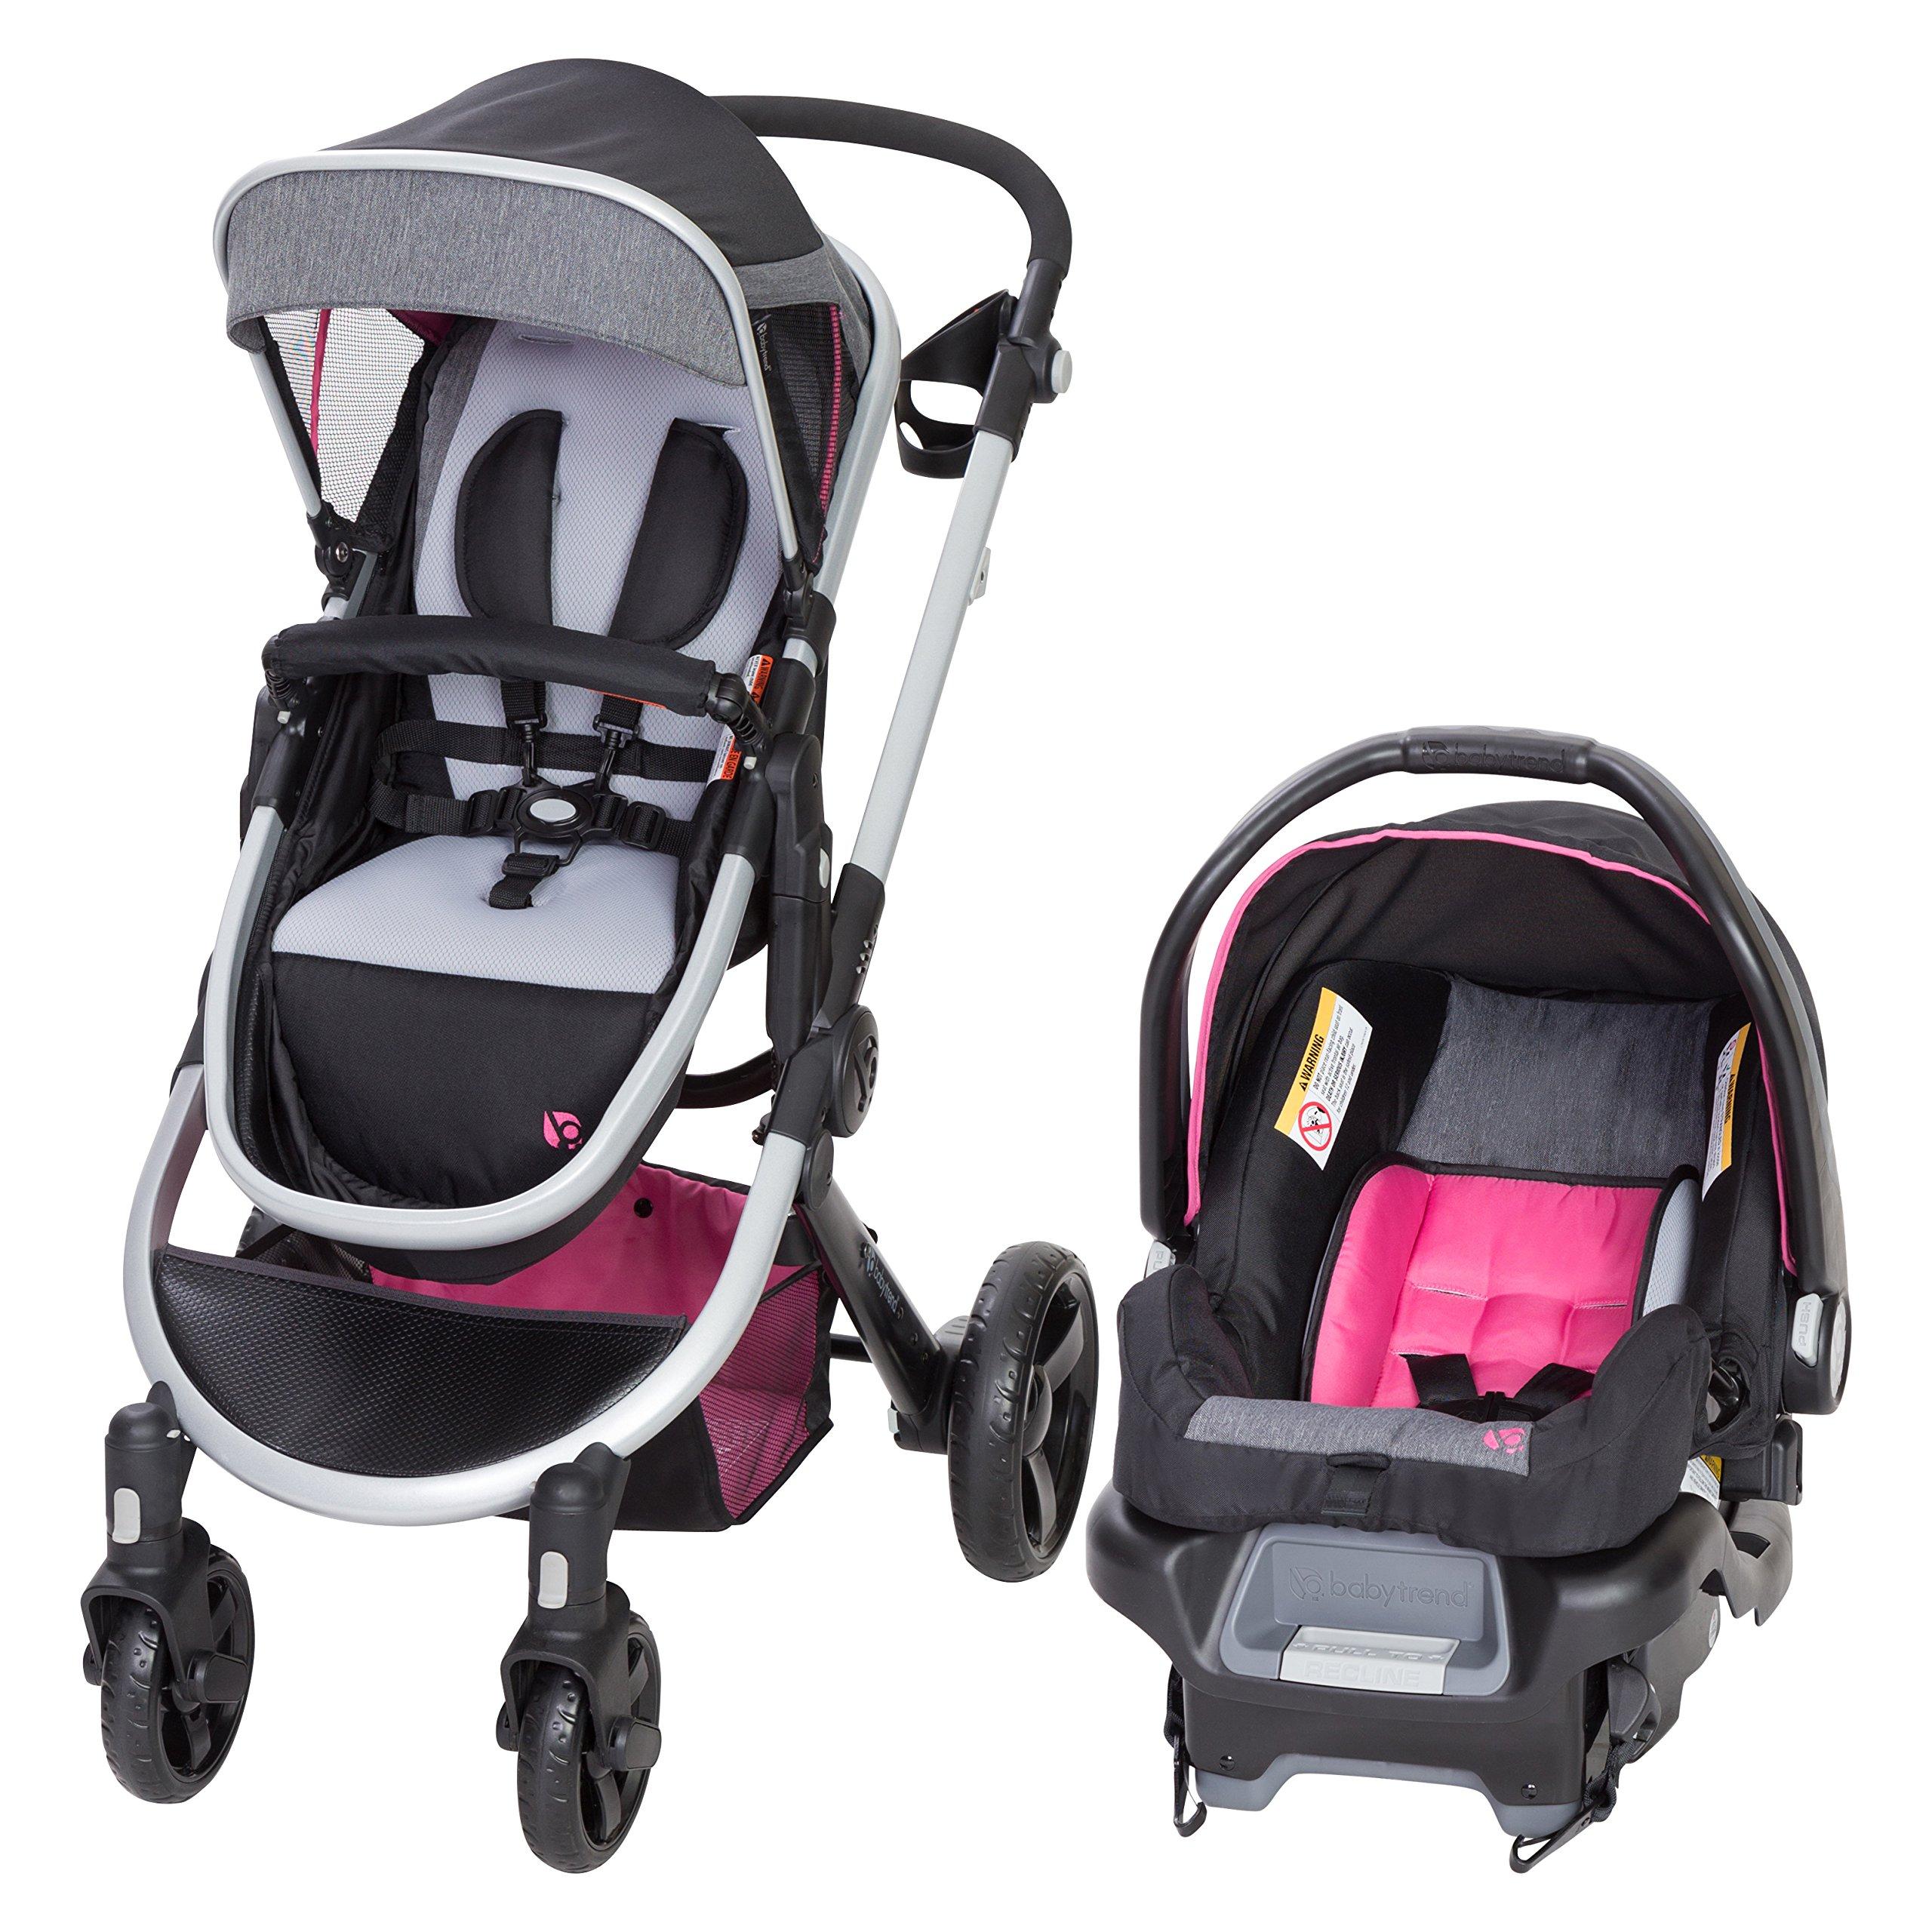 Baby Trend ESPY 35 Travel System, Patagonia